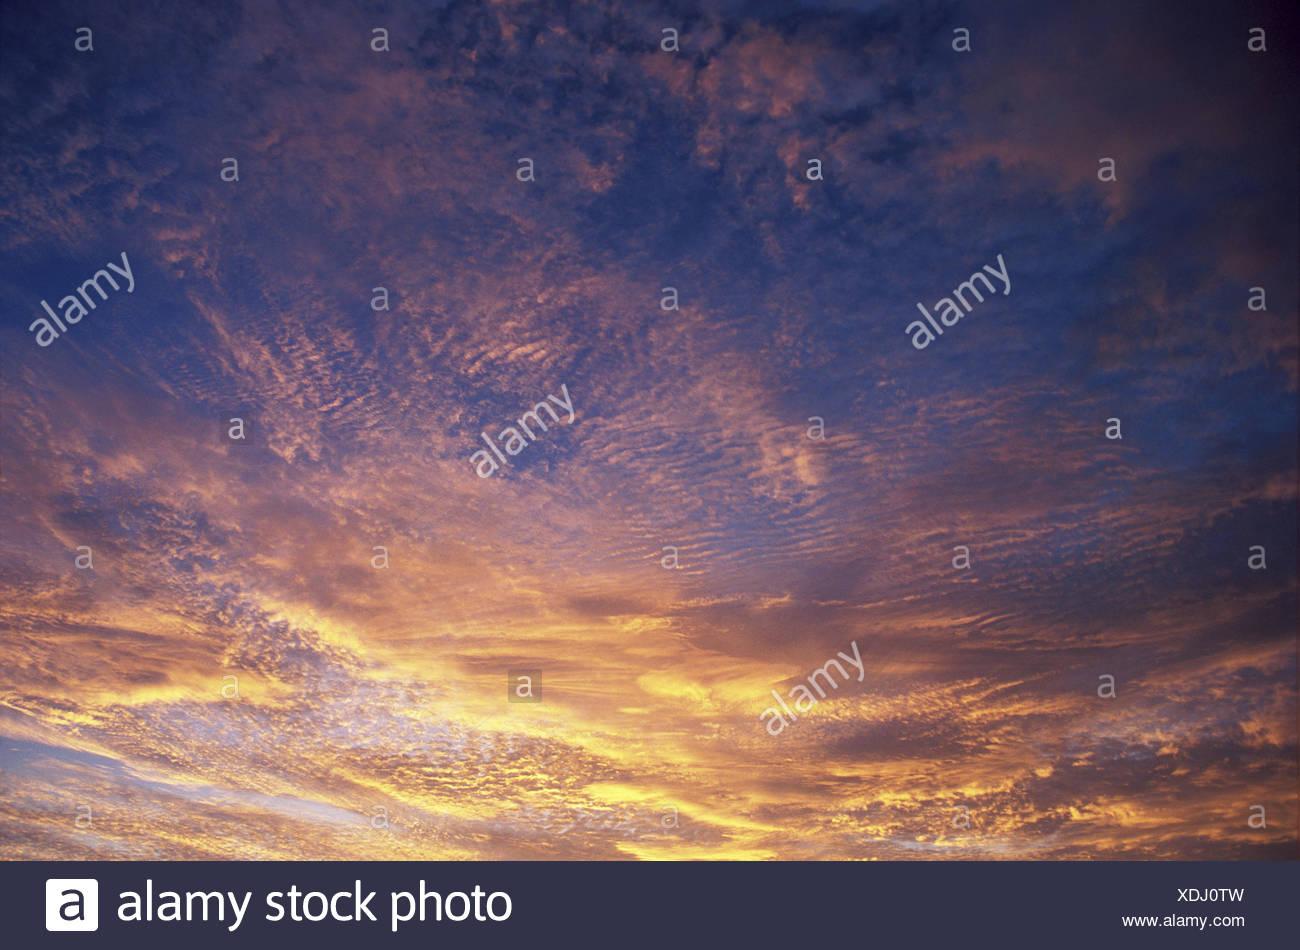 Wispy yellow orange clouds on blue sky. - Stock Image